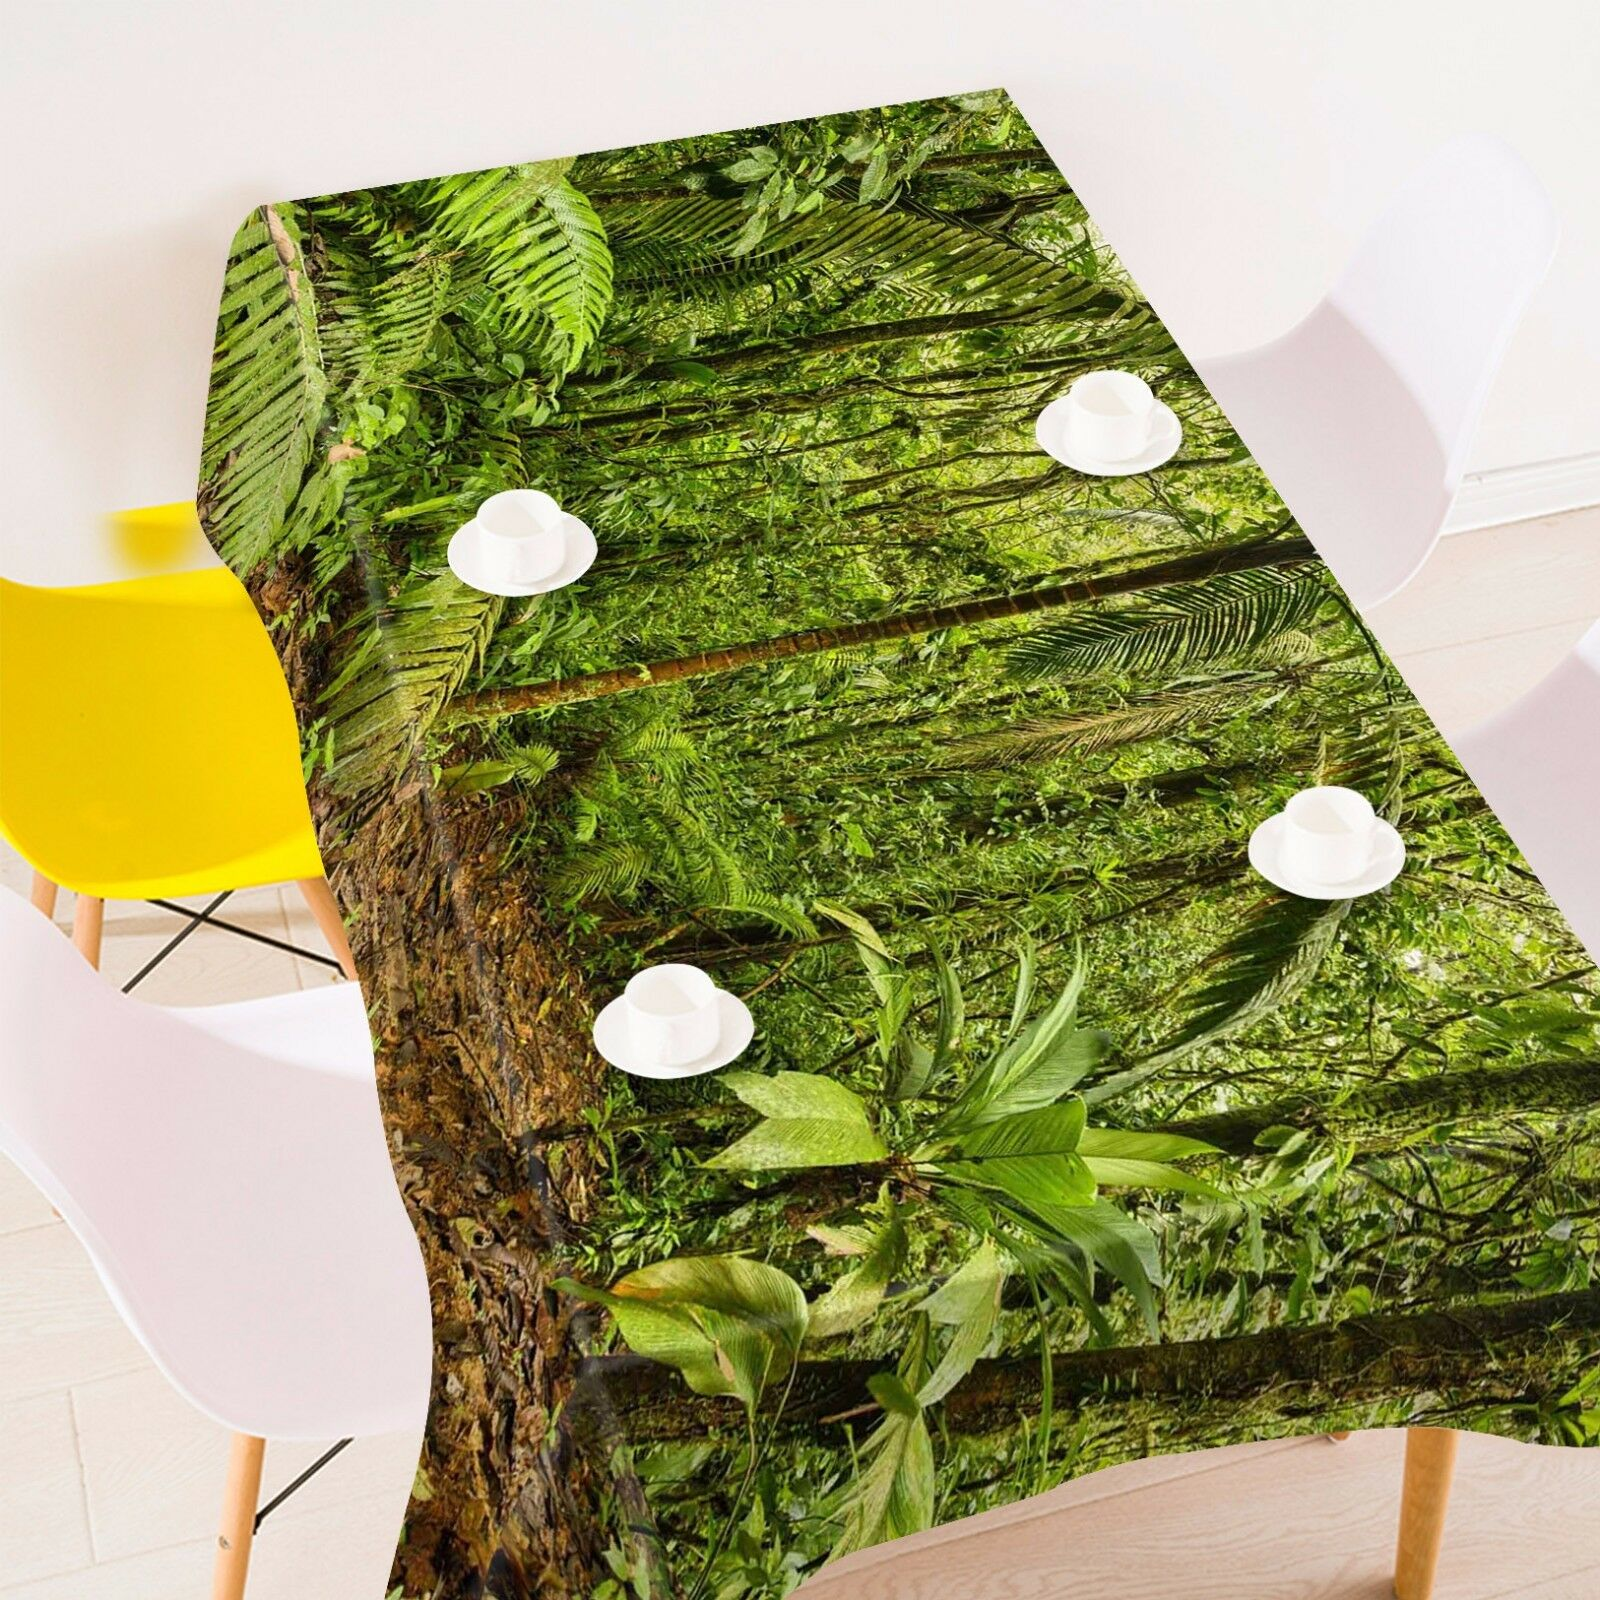 3D Forest 44 Tablecloth Tablecloth Tablecloth Table Cover Cloth Birthday Party AJ WALLPAPER UK Lemon 21ac55